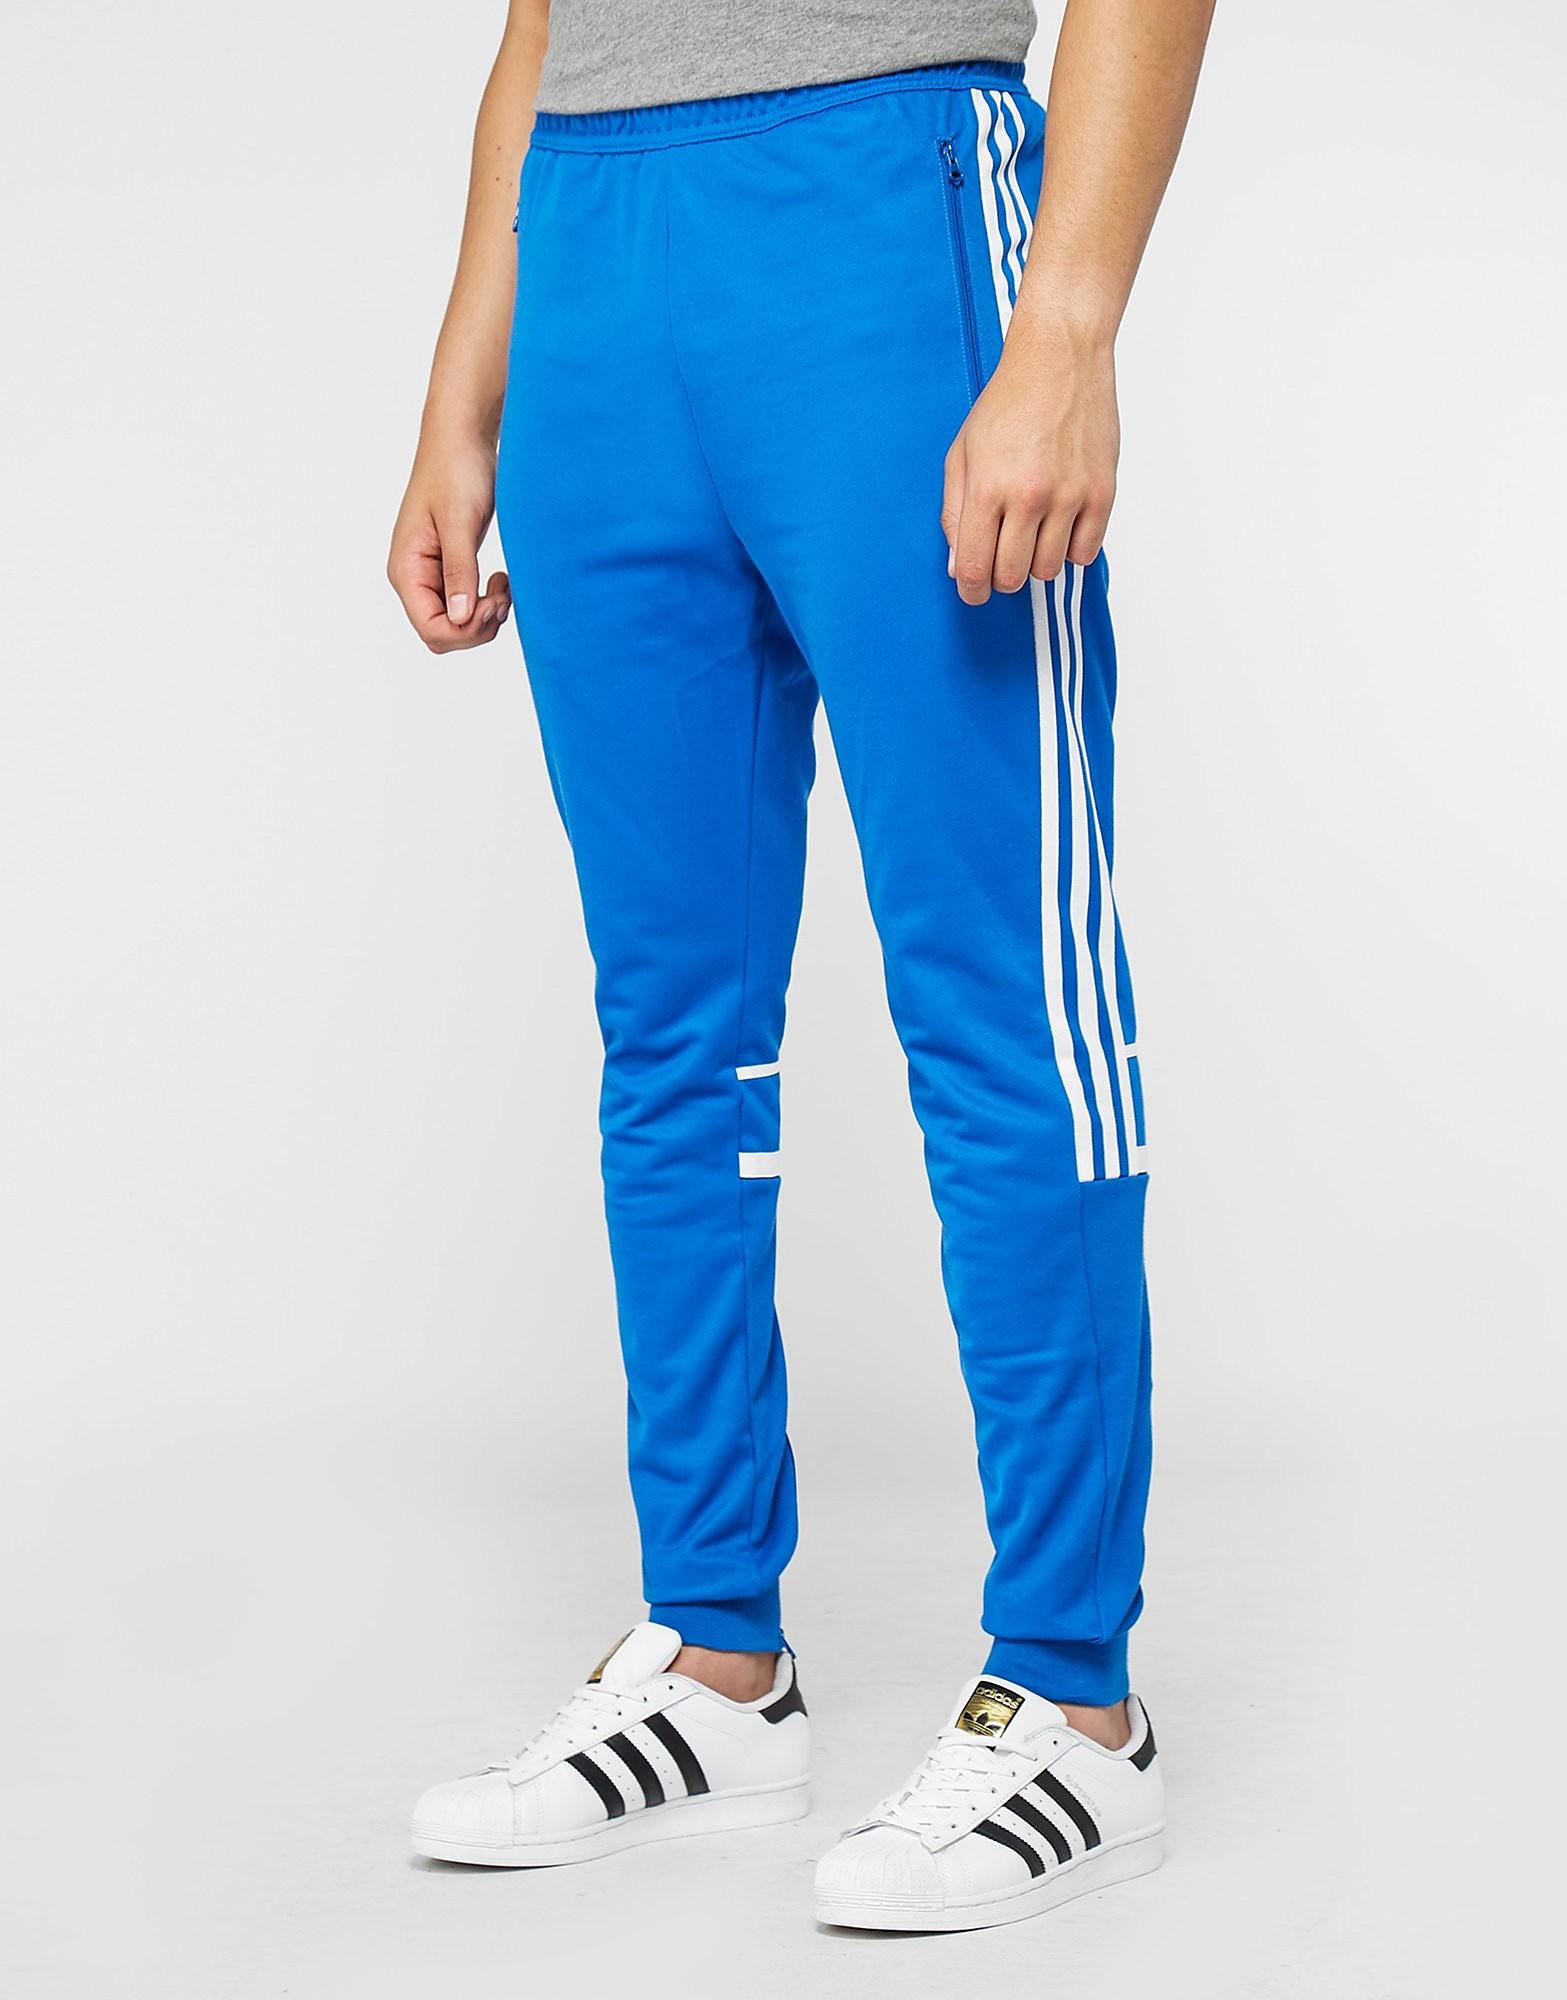 adidas Originals Challenger Track Pants  Blue Blue